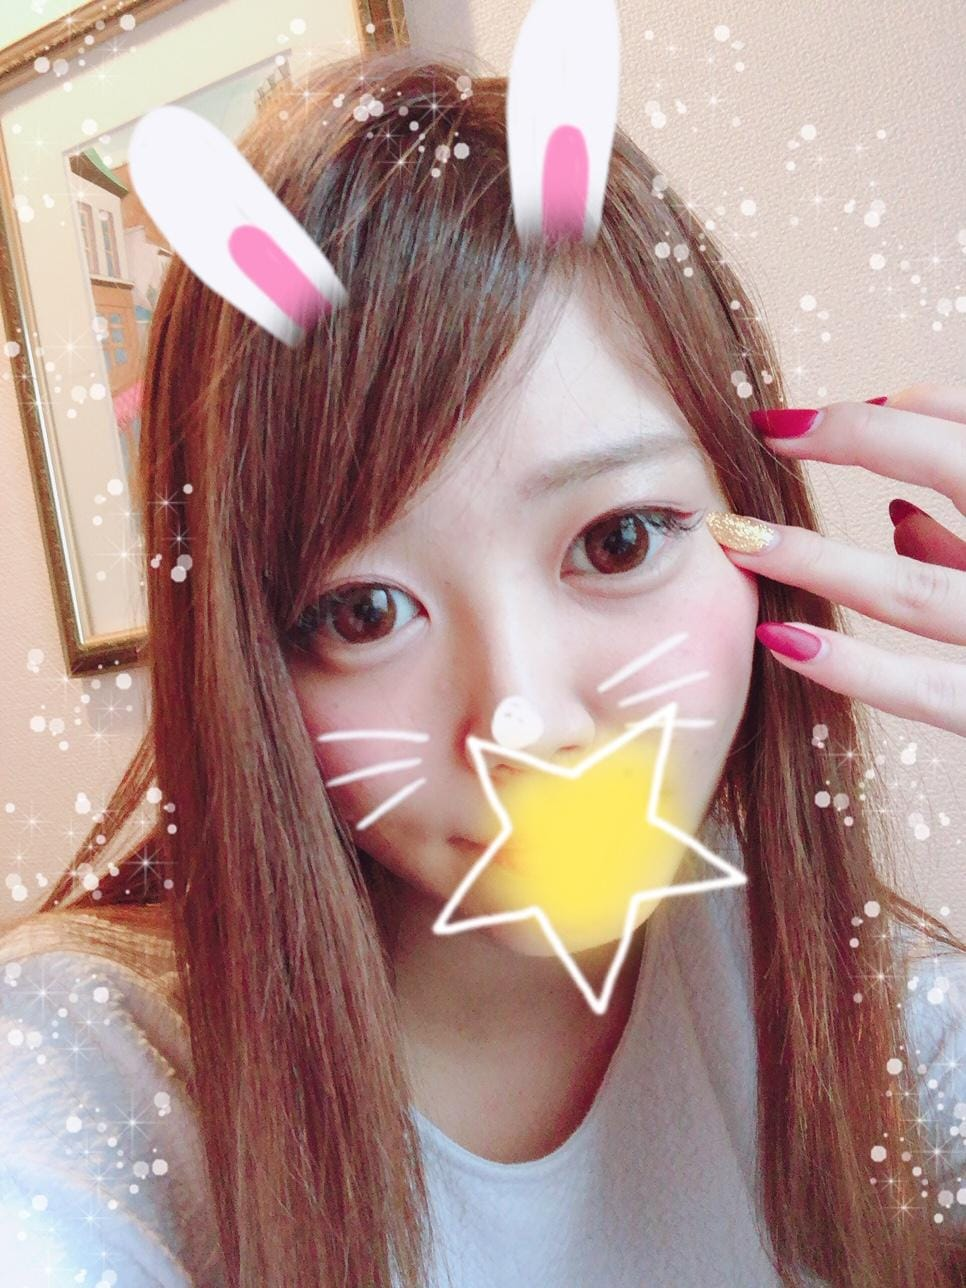 「agehAのお客様」10/23(10/23) 23:08   涼宮のんの写メ・風俗動画